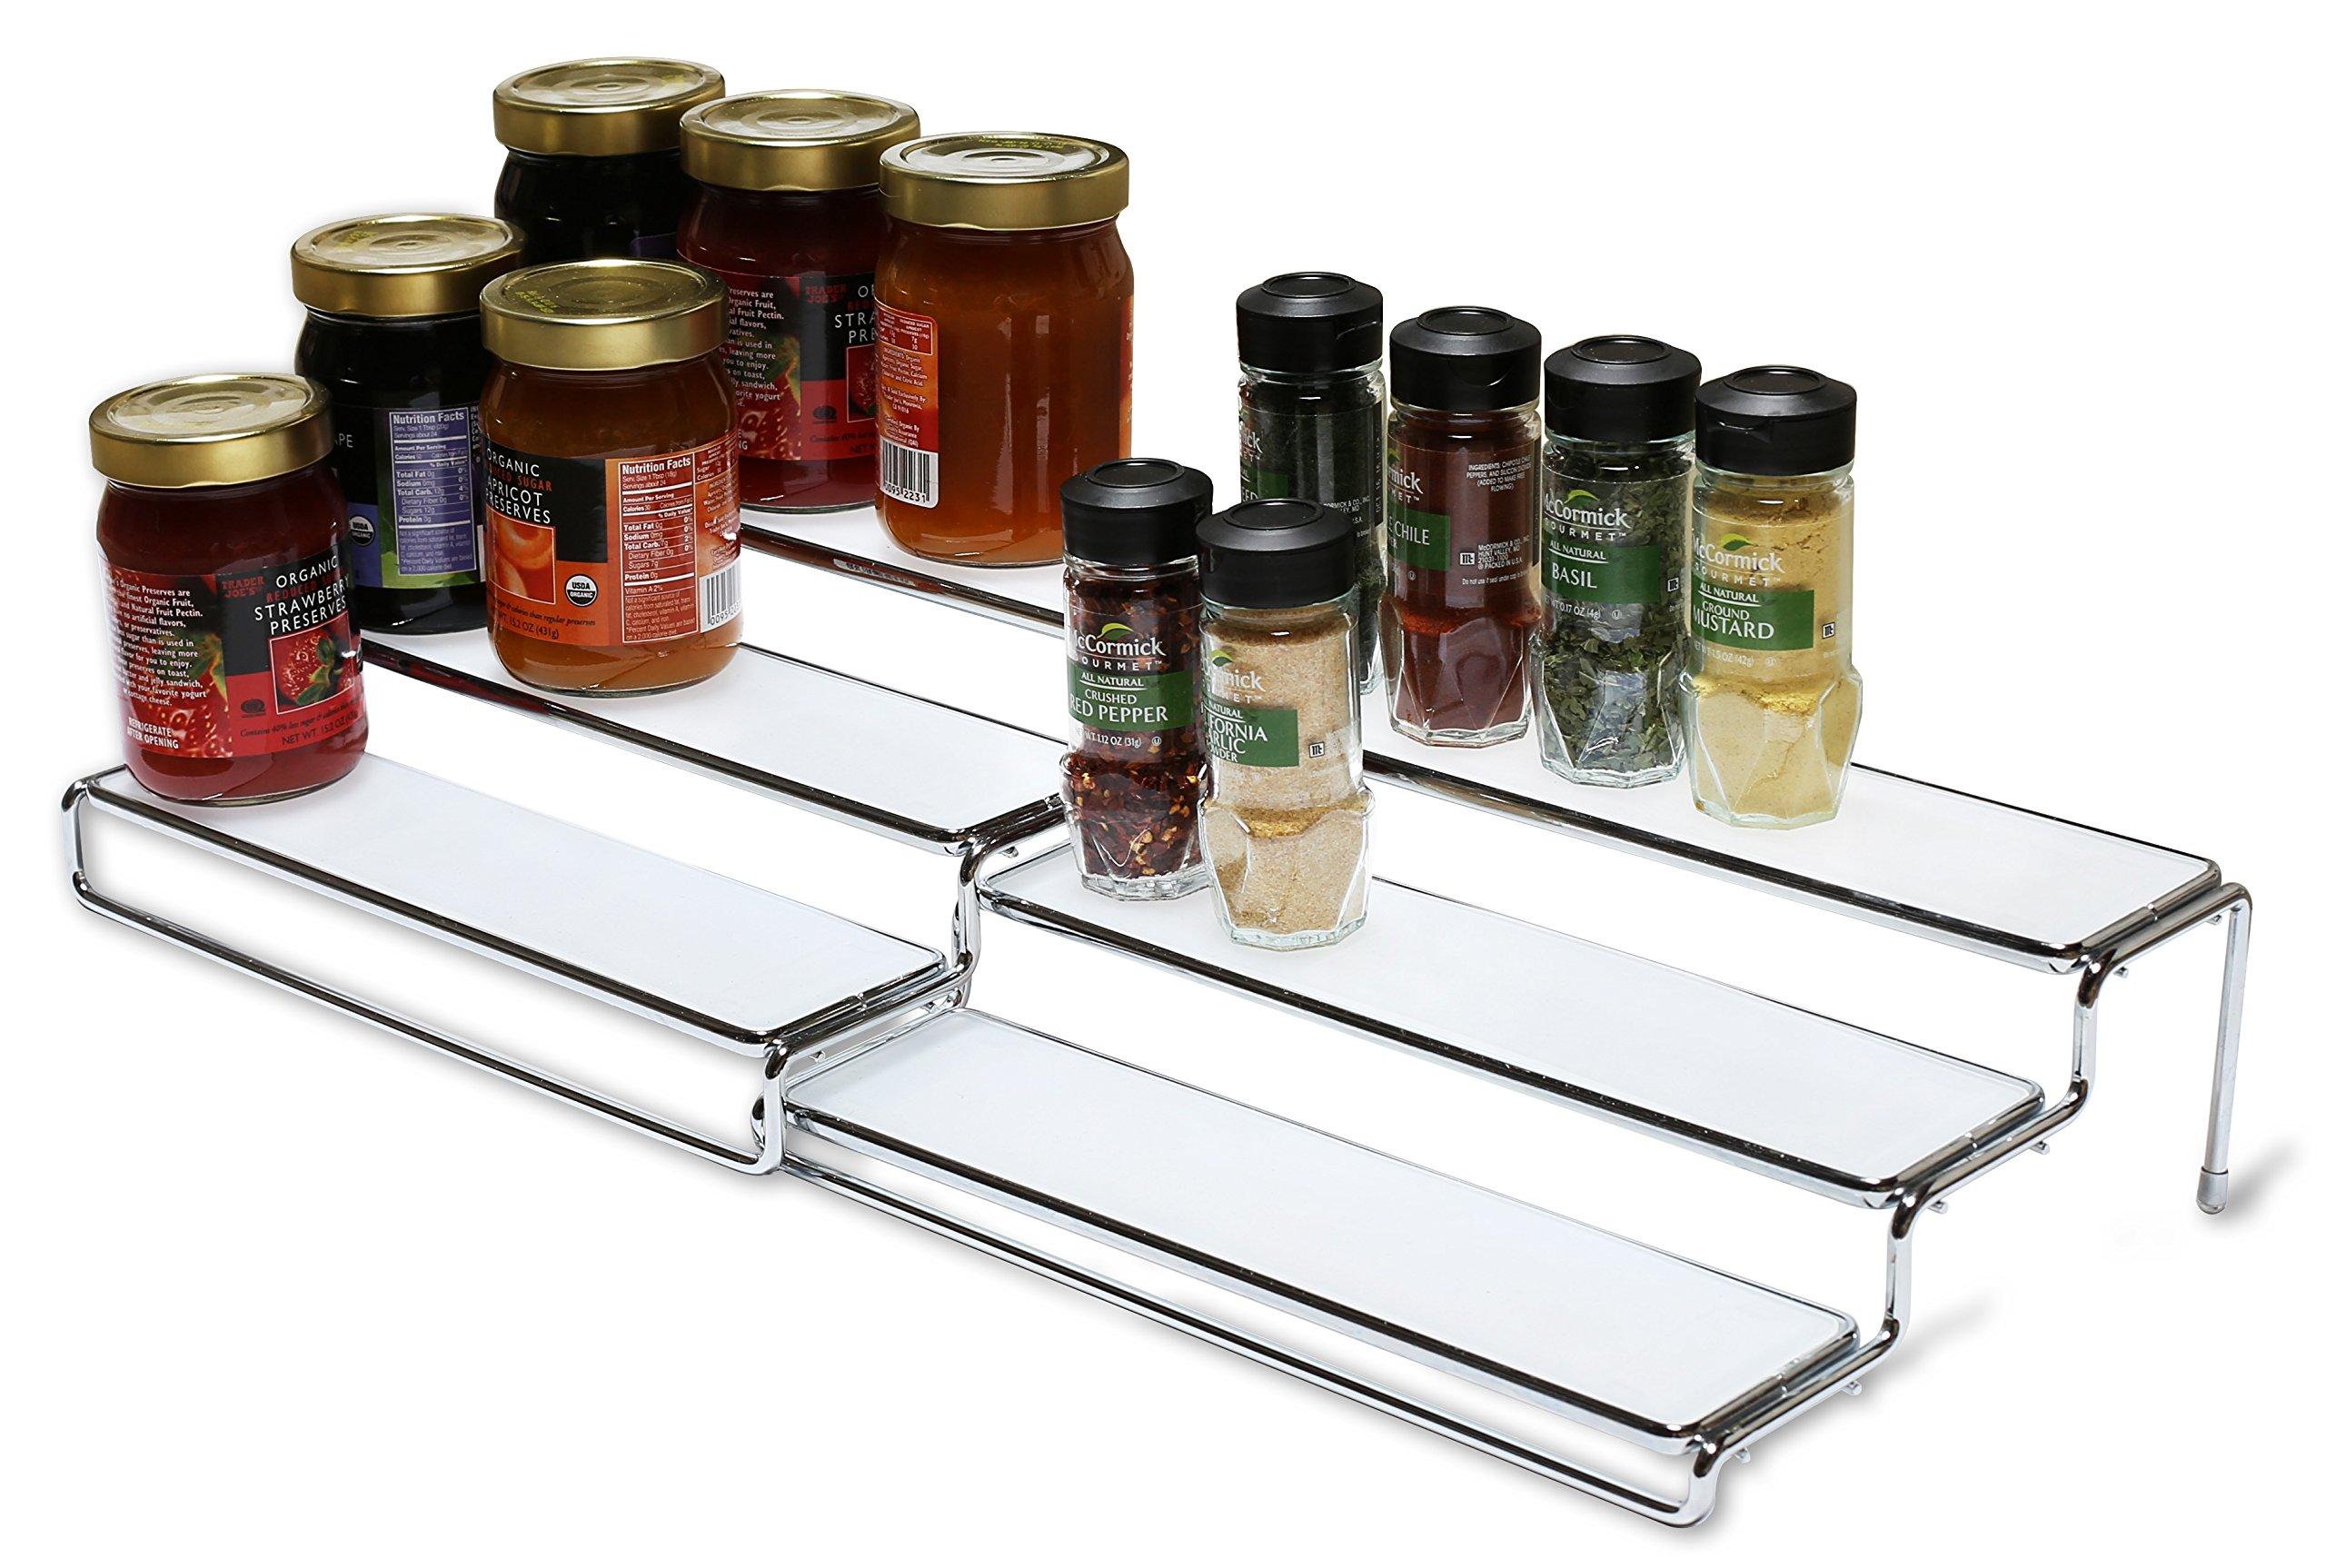 decobros 3 tier expandable cabinet spice rack step shelf organizer 125 25 inch